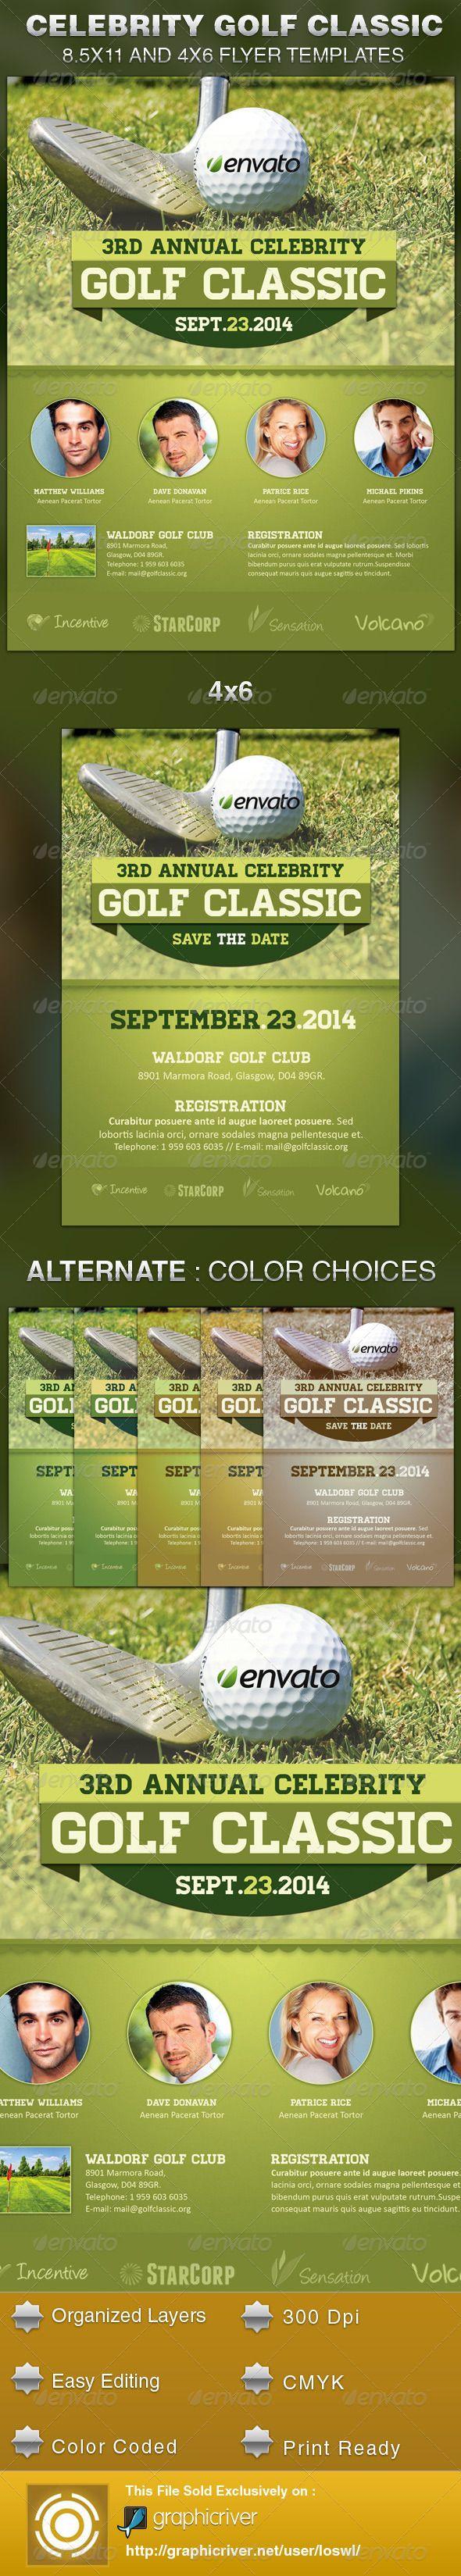 Organize a Charity Golf Tournament | GolfRegistrations